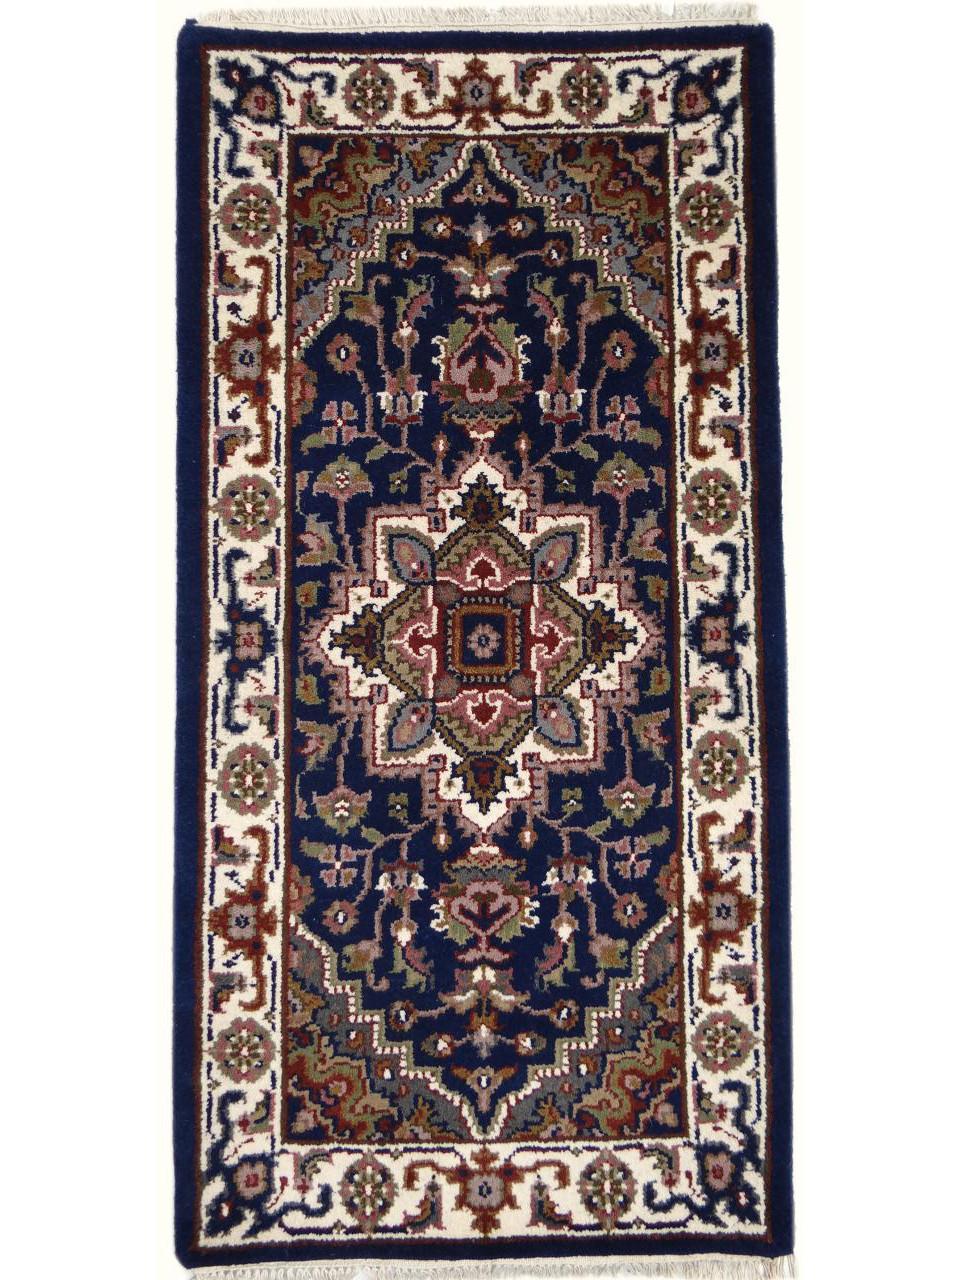 Classic rugs - Imperial-Heriz blue